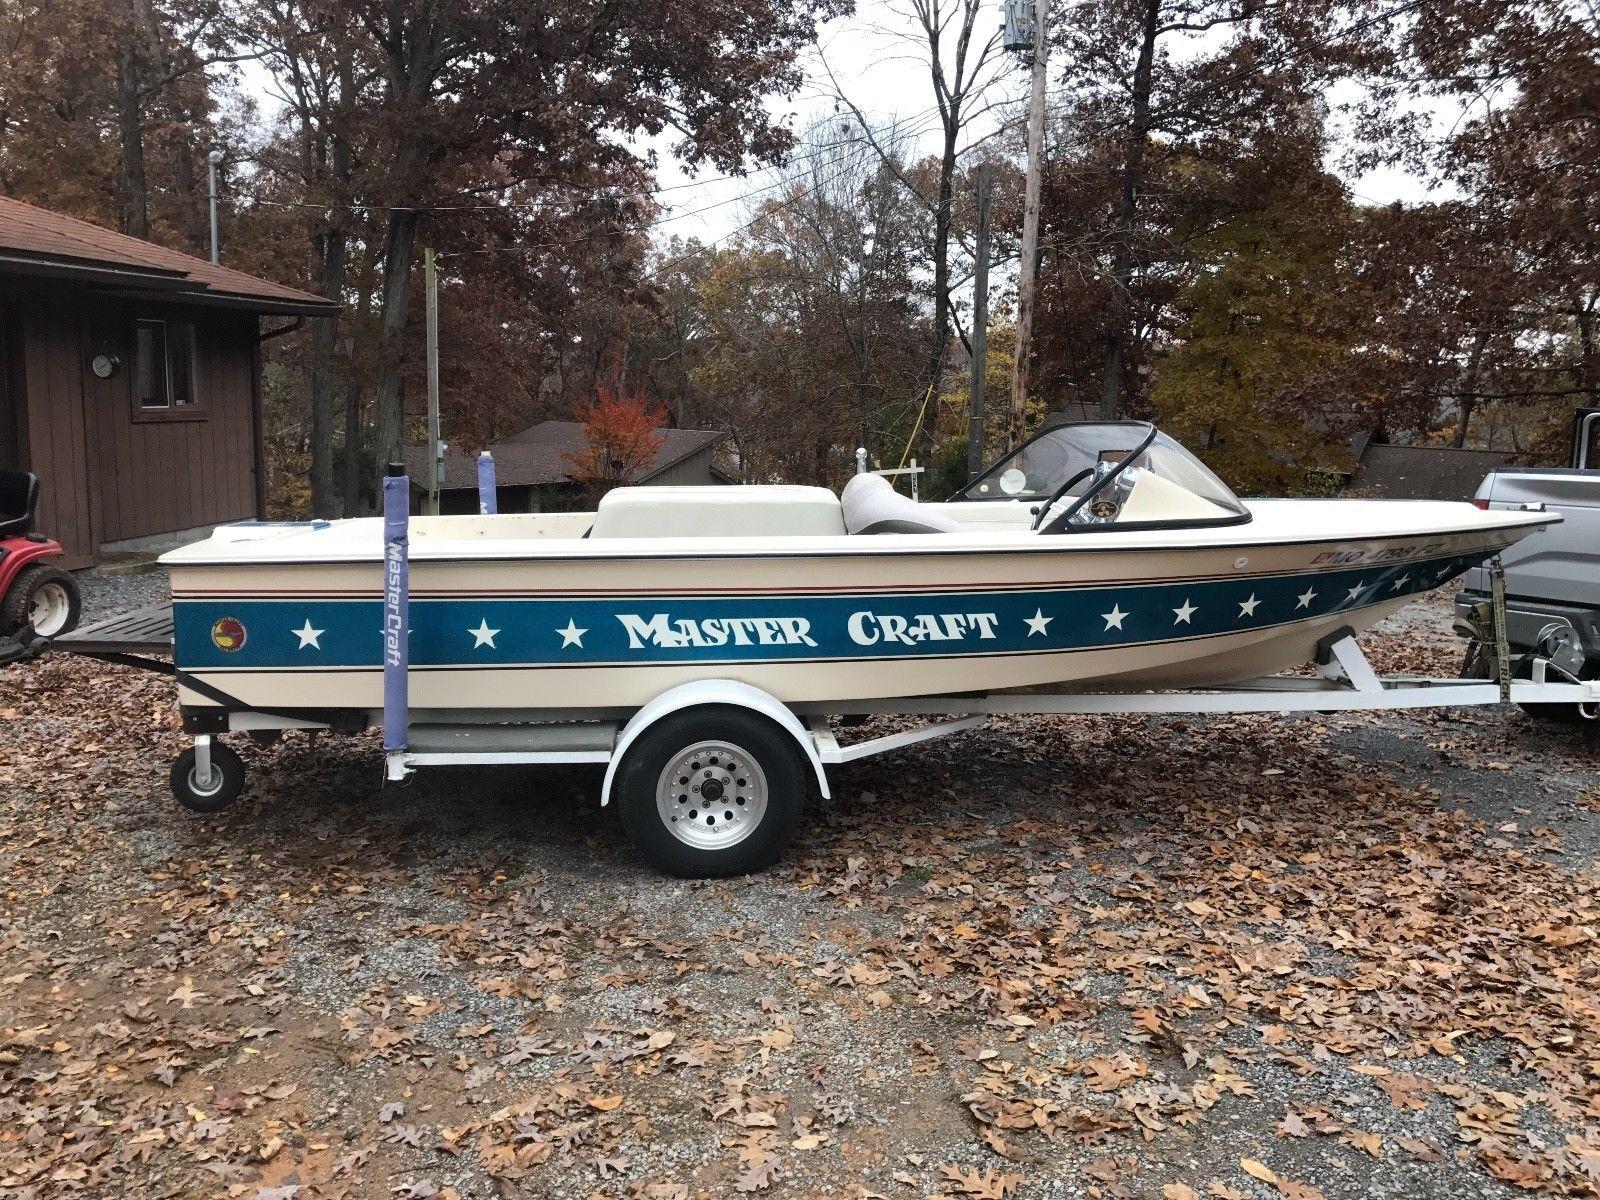 1980 Mastercraft Stars And Stripes Mastercraft Boat Ski Boats For Sale Mastercraft